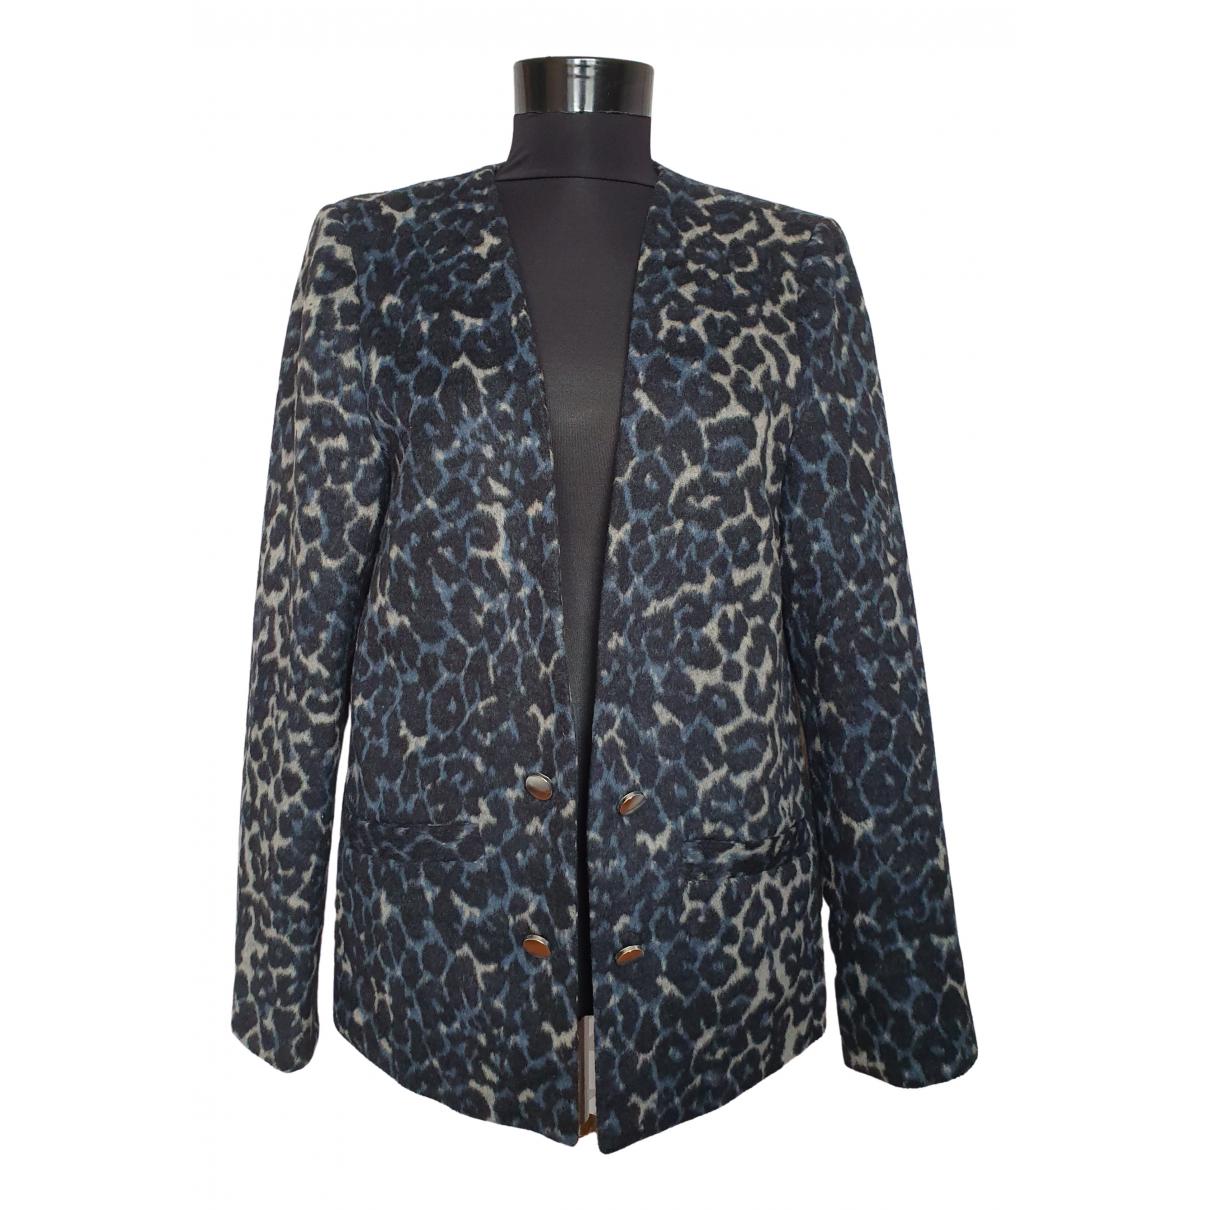 Gestuz \N Multicolour jacket for Women 38 FR